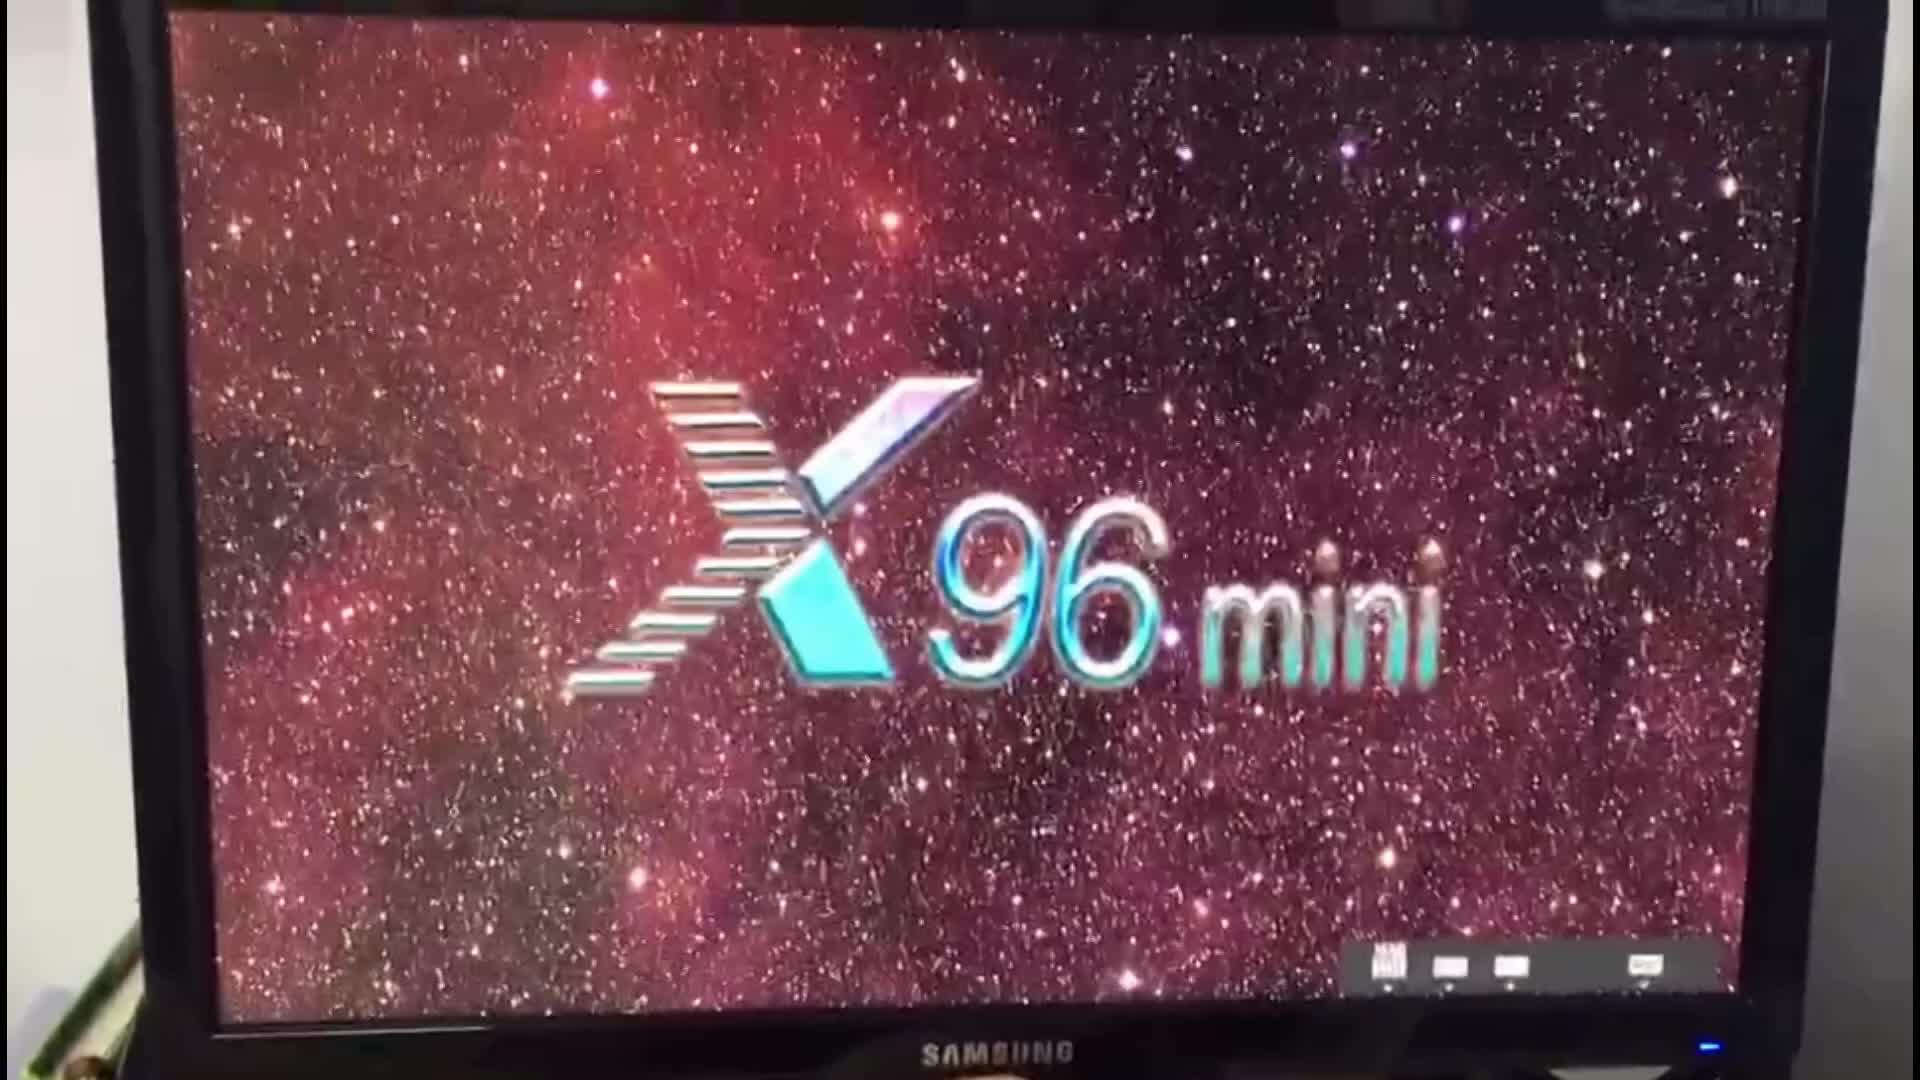 2019 Nieuwste en Goedkoopste Android 7.1 TV BOX x96 Mini Amlogic S905W Quad Core 1G RAM 8G ROM smart TV BOX